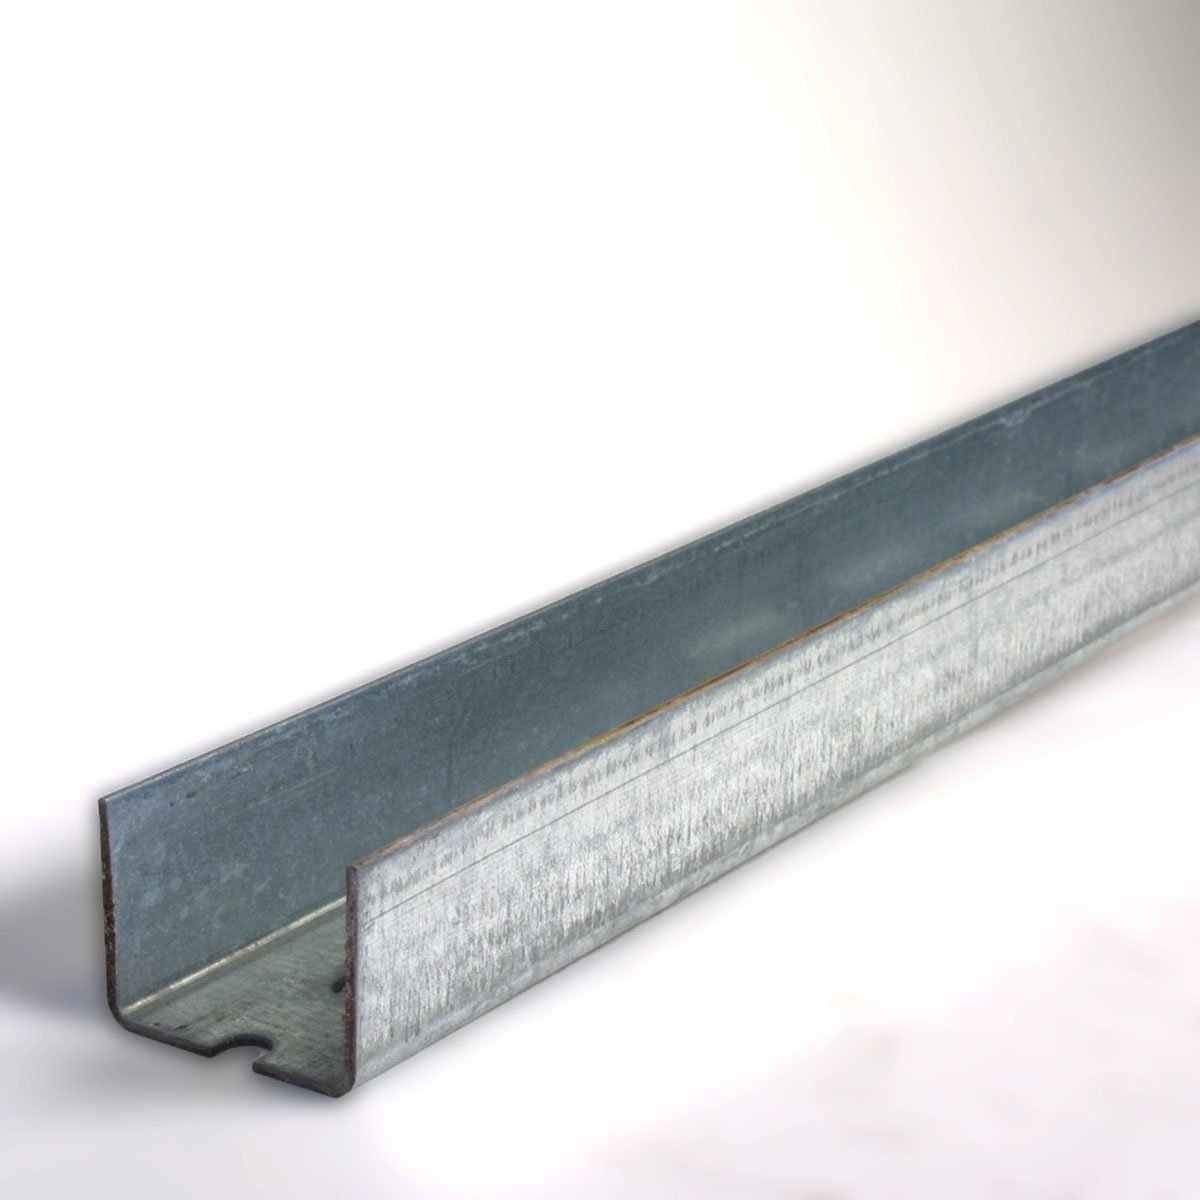 Sádrokartonový profil UA 50 2600 mm